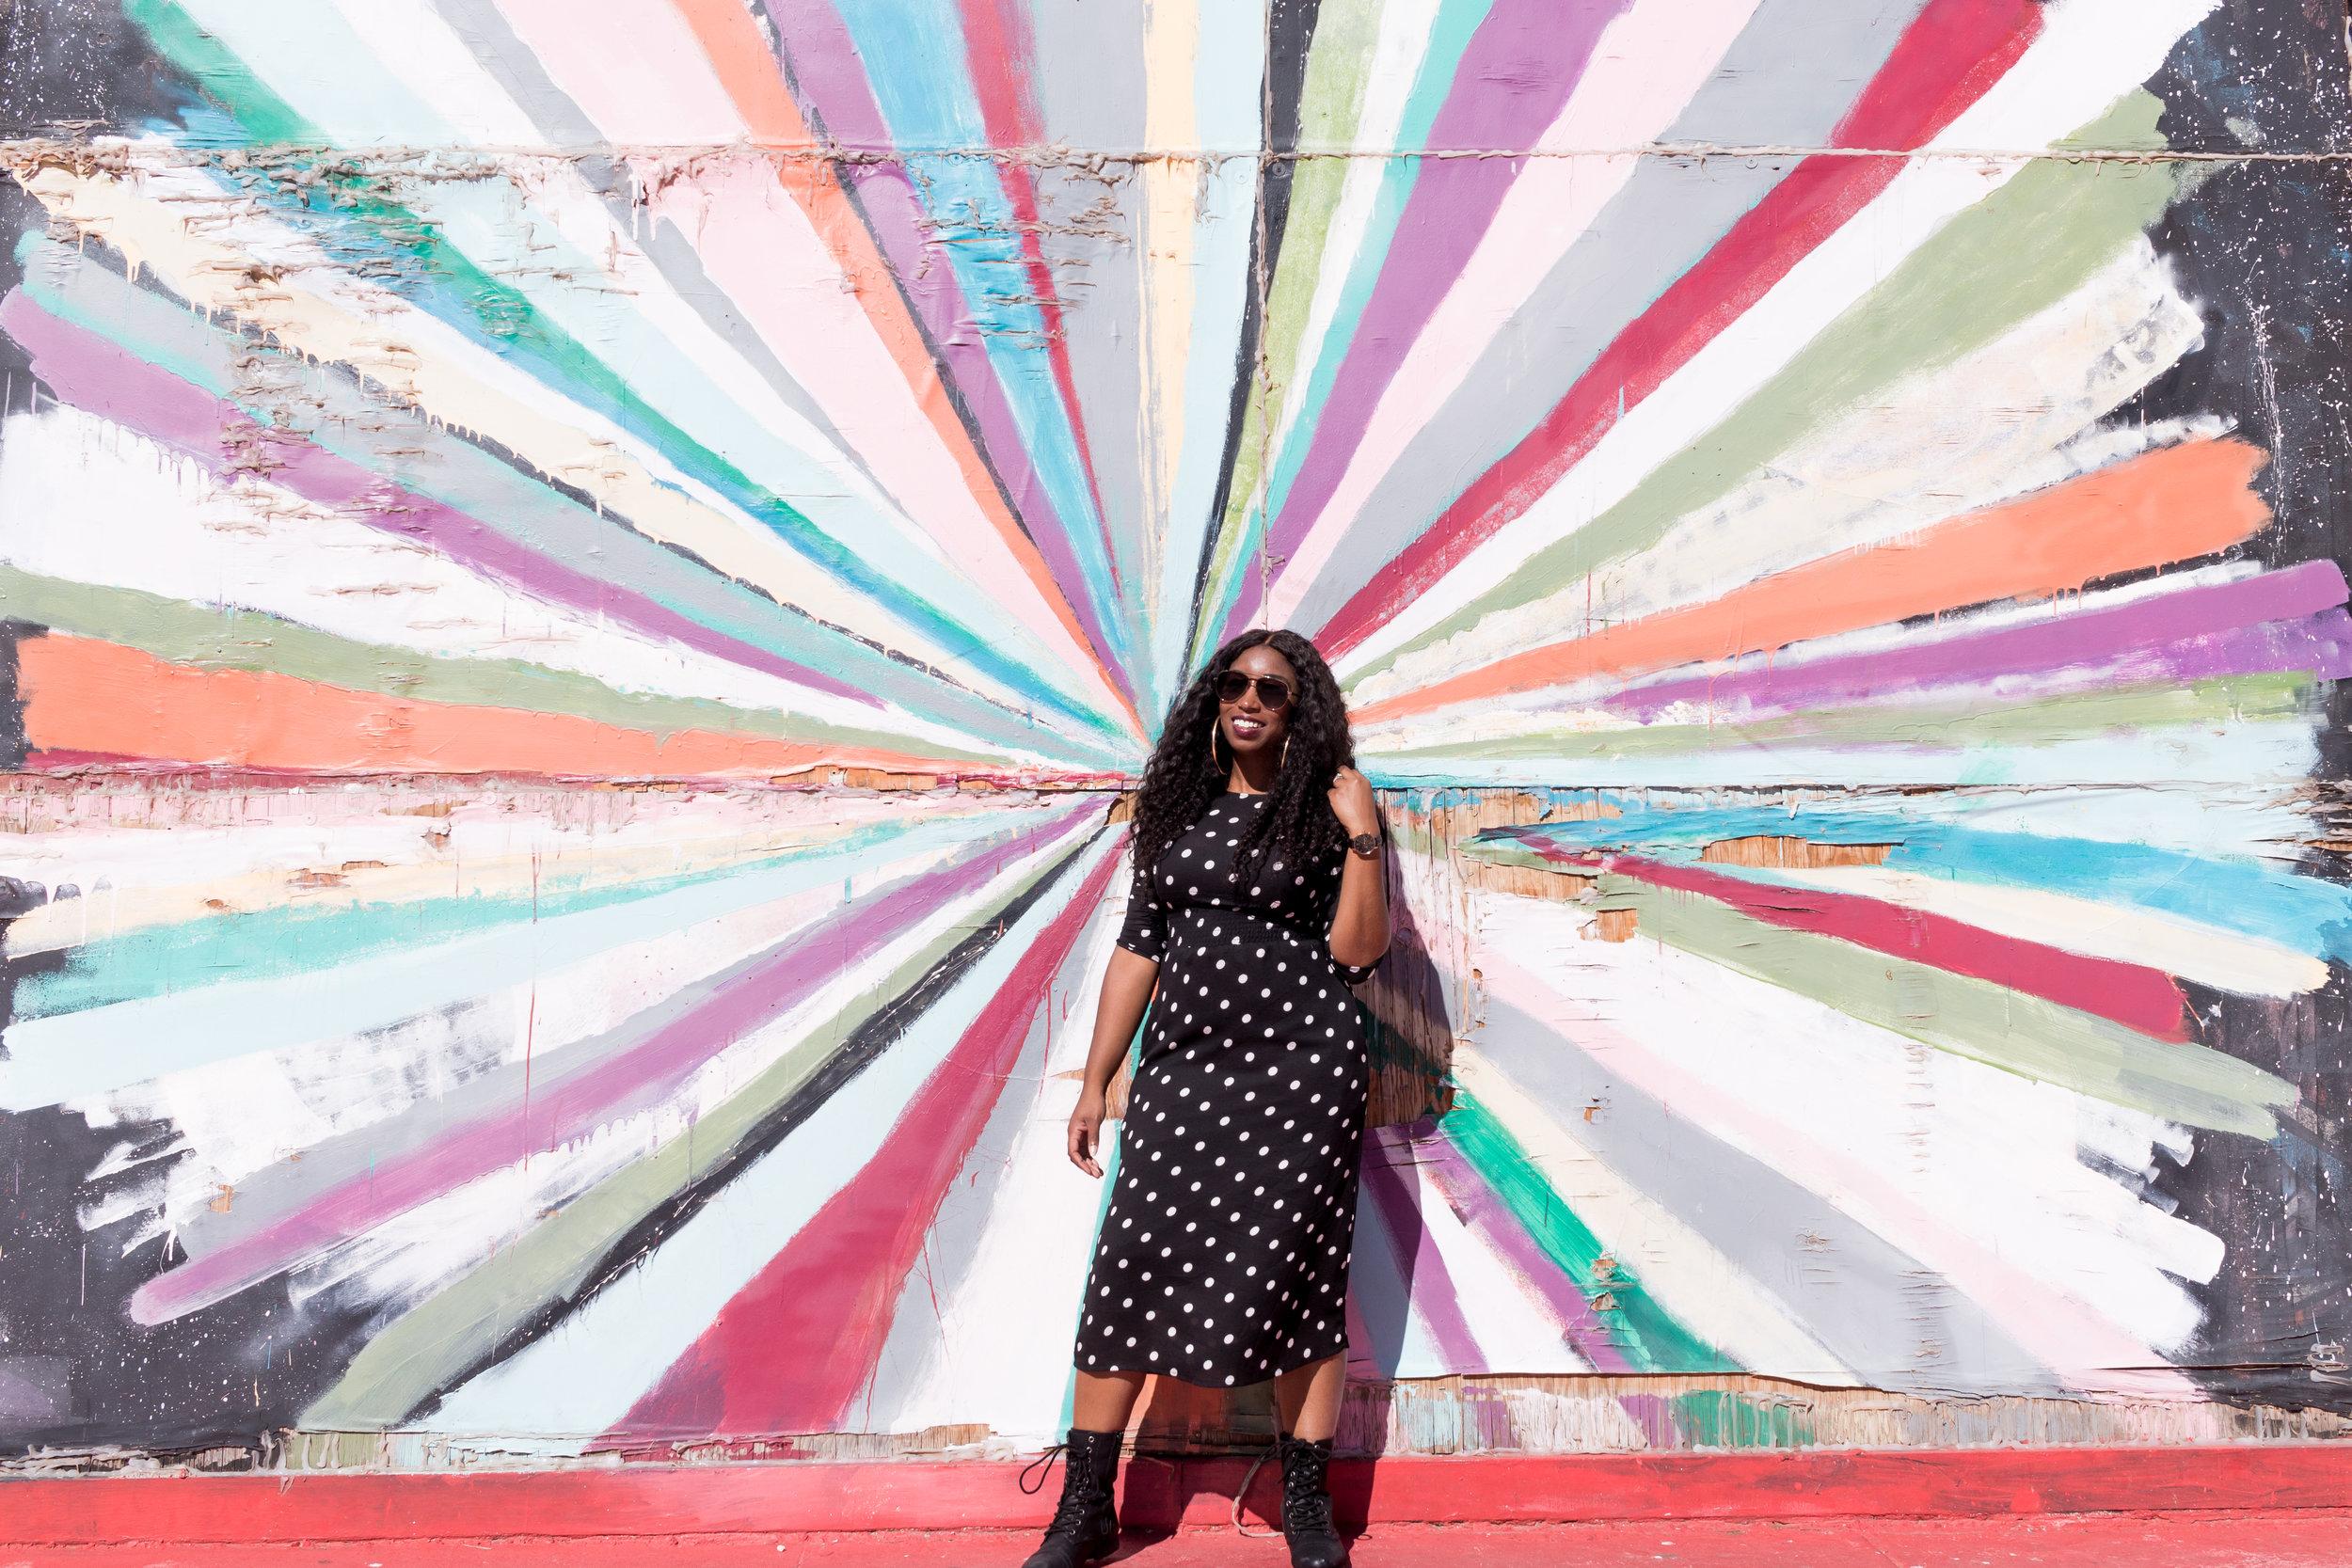 oklahoma-city-best-murals-for-Instagram